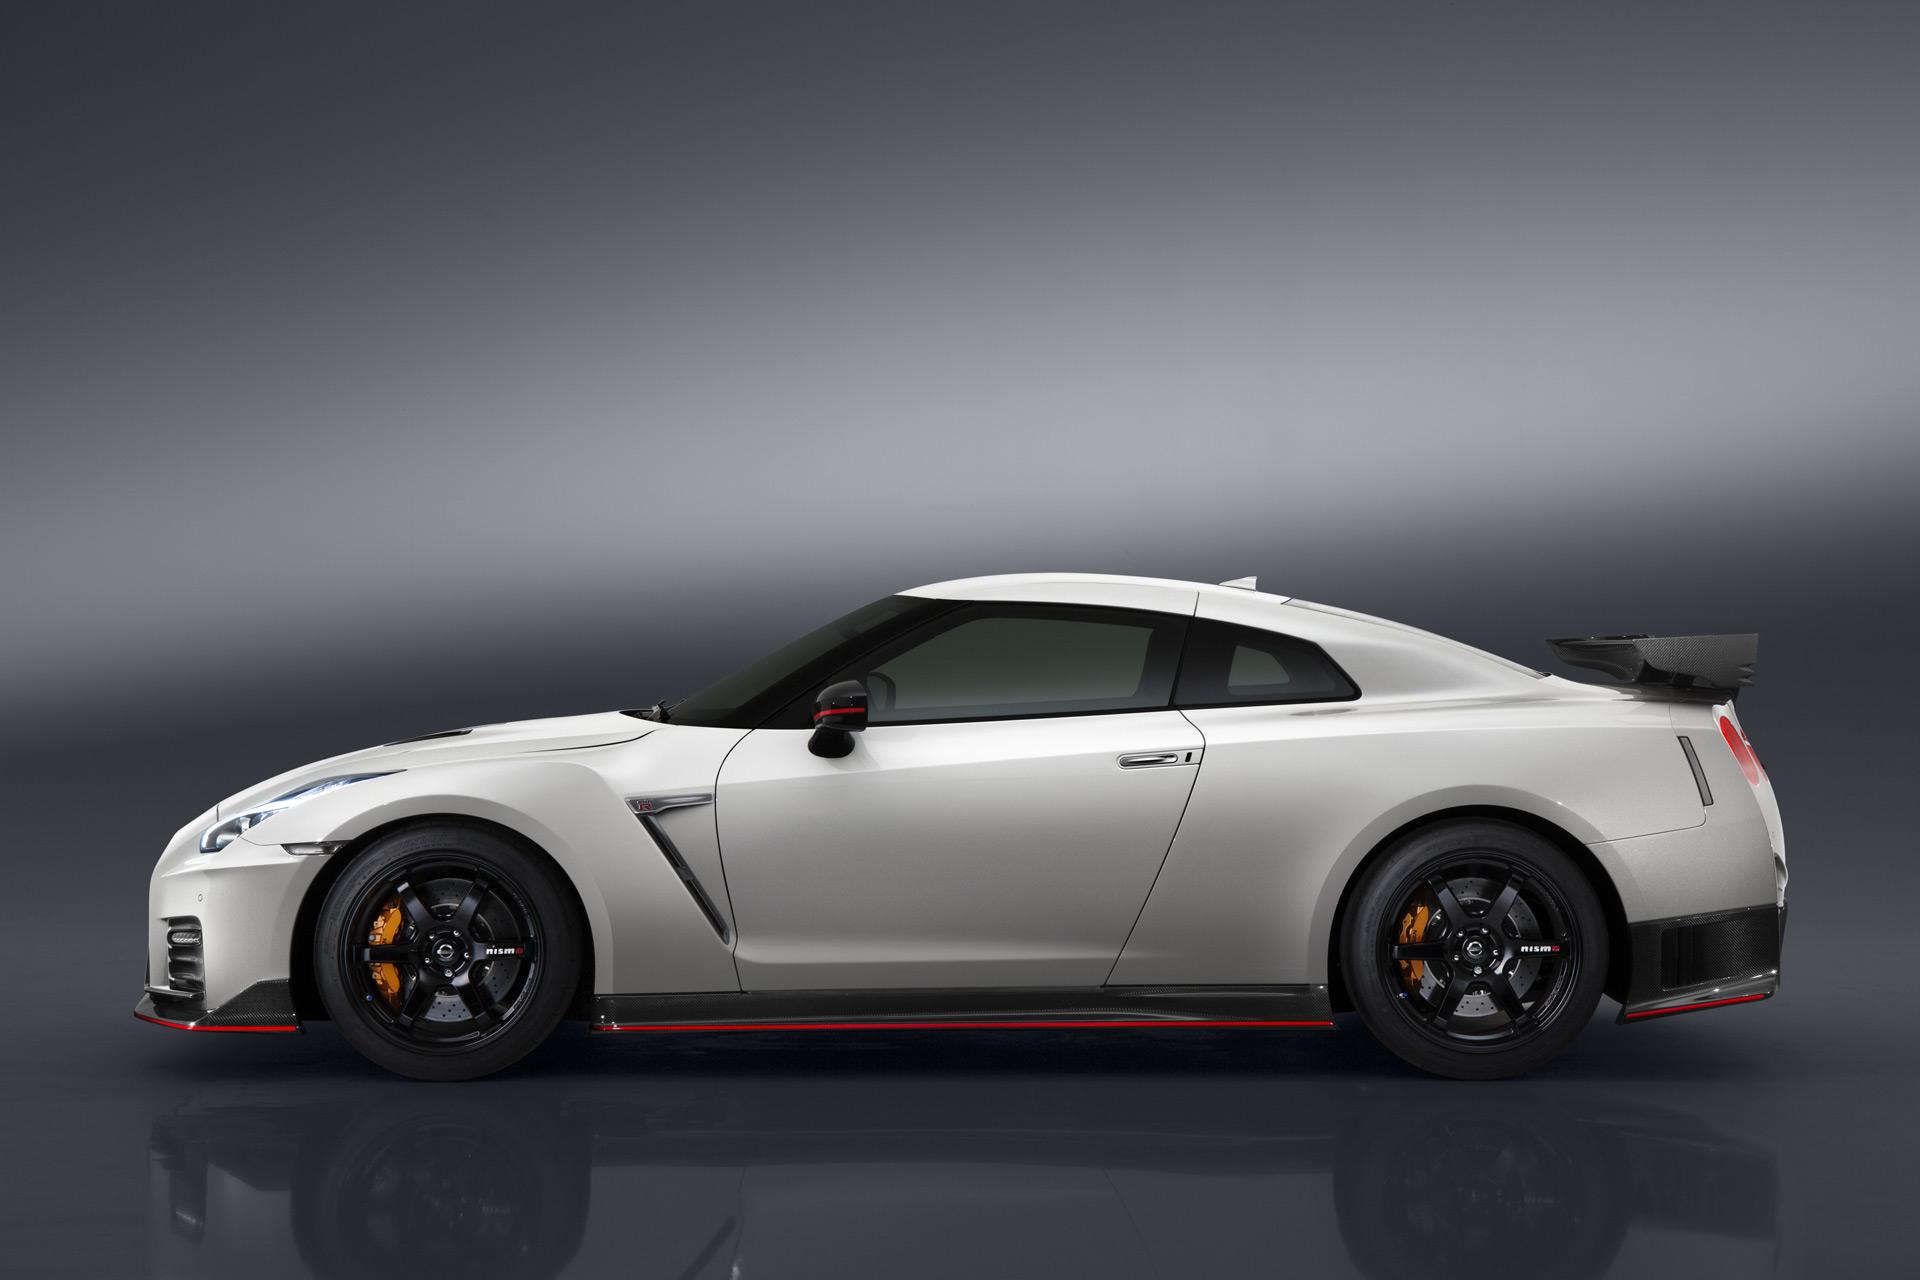 2017 Nissan GT R Nismo 2017 Bentley Continental GT Speed